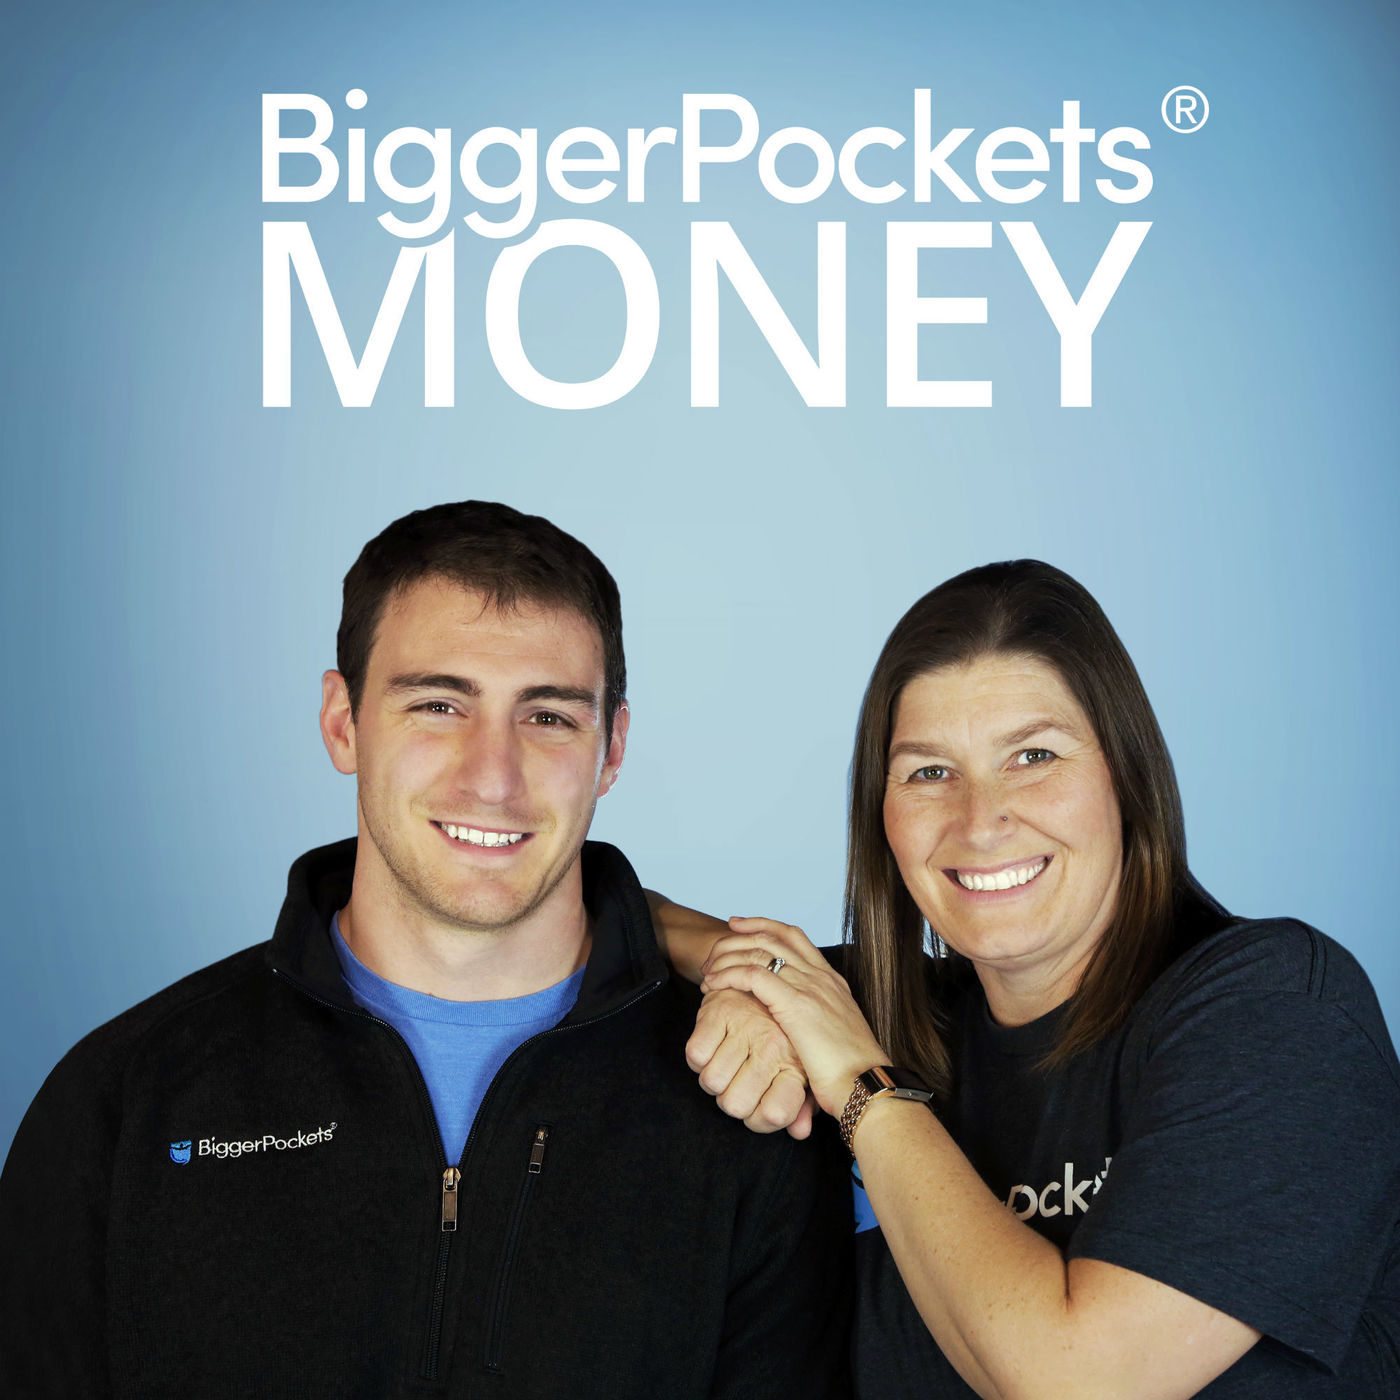 the BiggerPockets money podcast logo